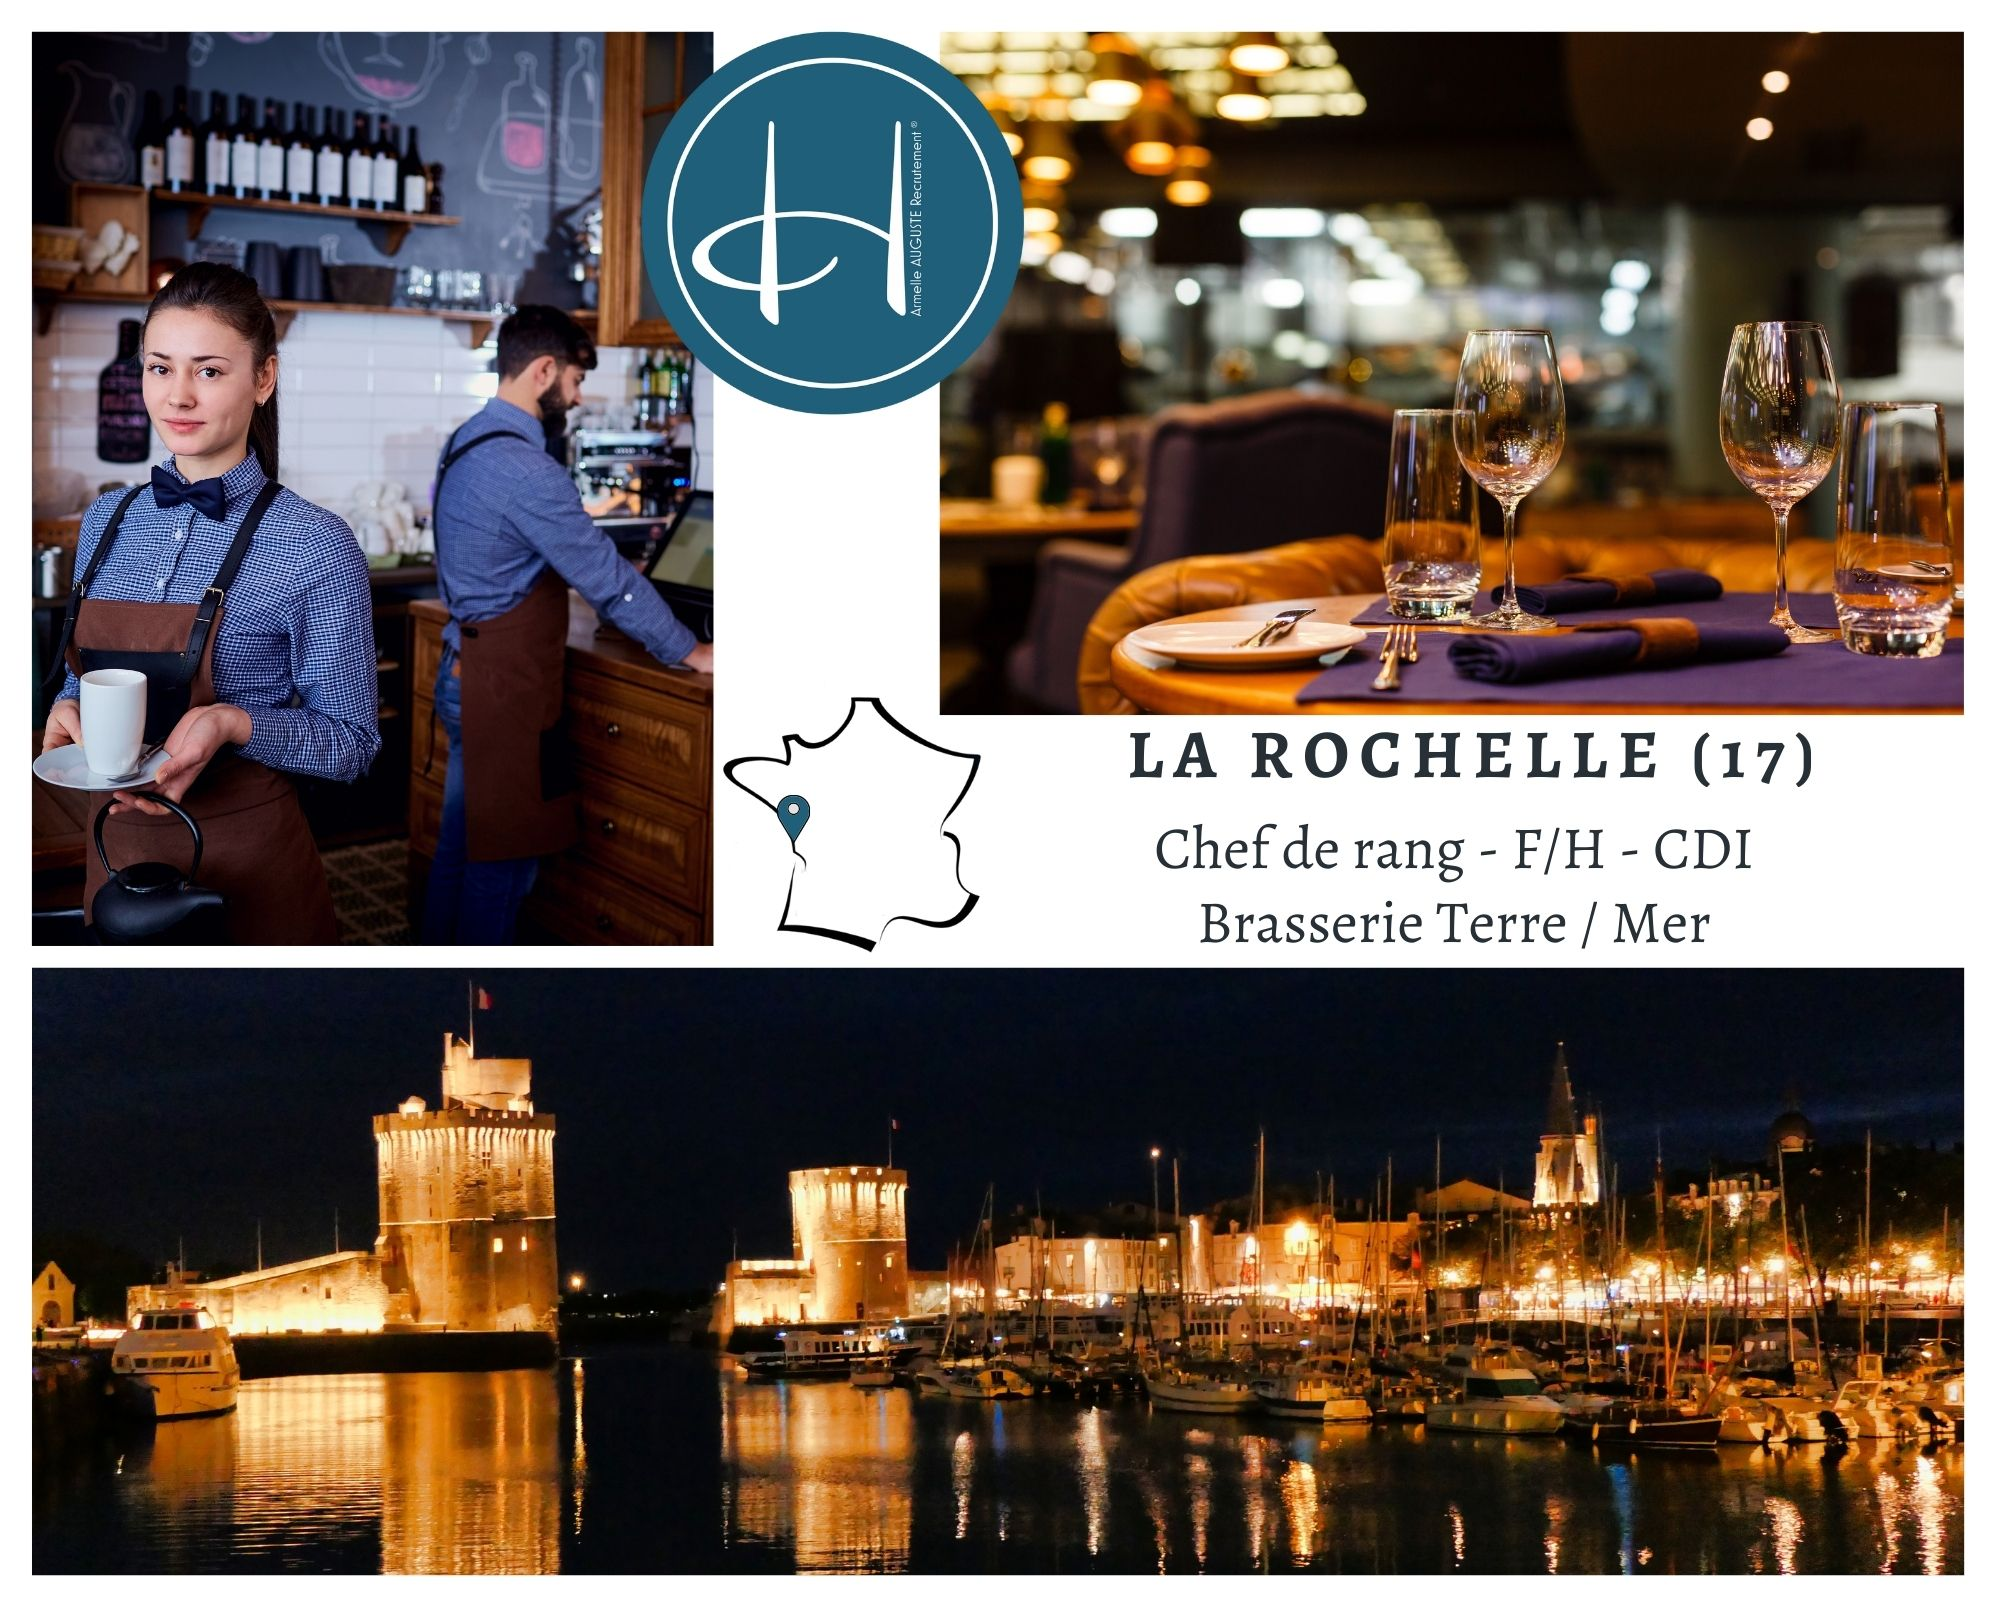 Recrutement: Chef de rang Brasserie Terre/Mer La Rochelle (17) F/H chez Armelle AUGUSTE Recrutement® à la rochelle